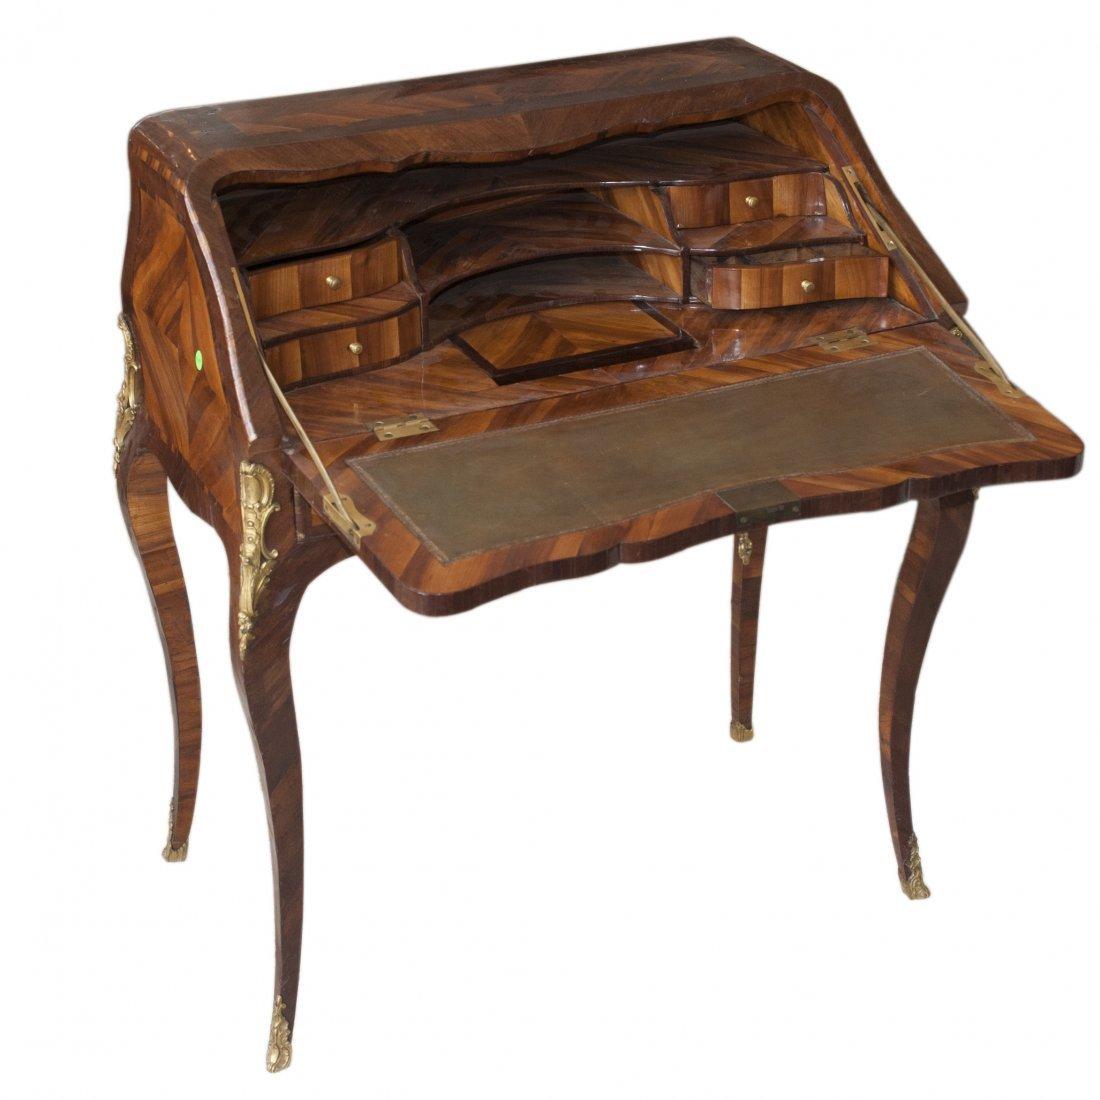 Wooden Lady's Desk